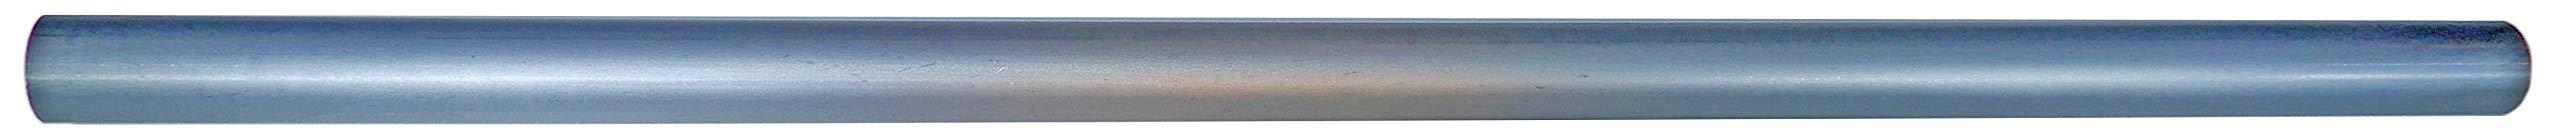 Castlebar 5.30mm x 330mm, Grade 9008/C2, Unground